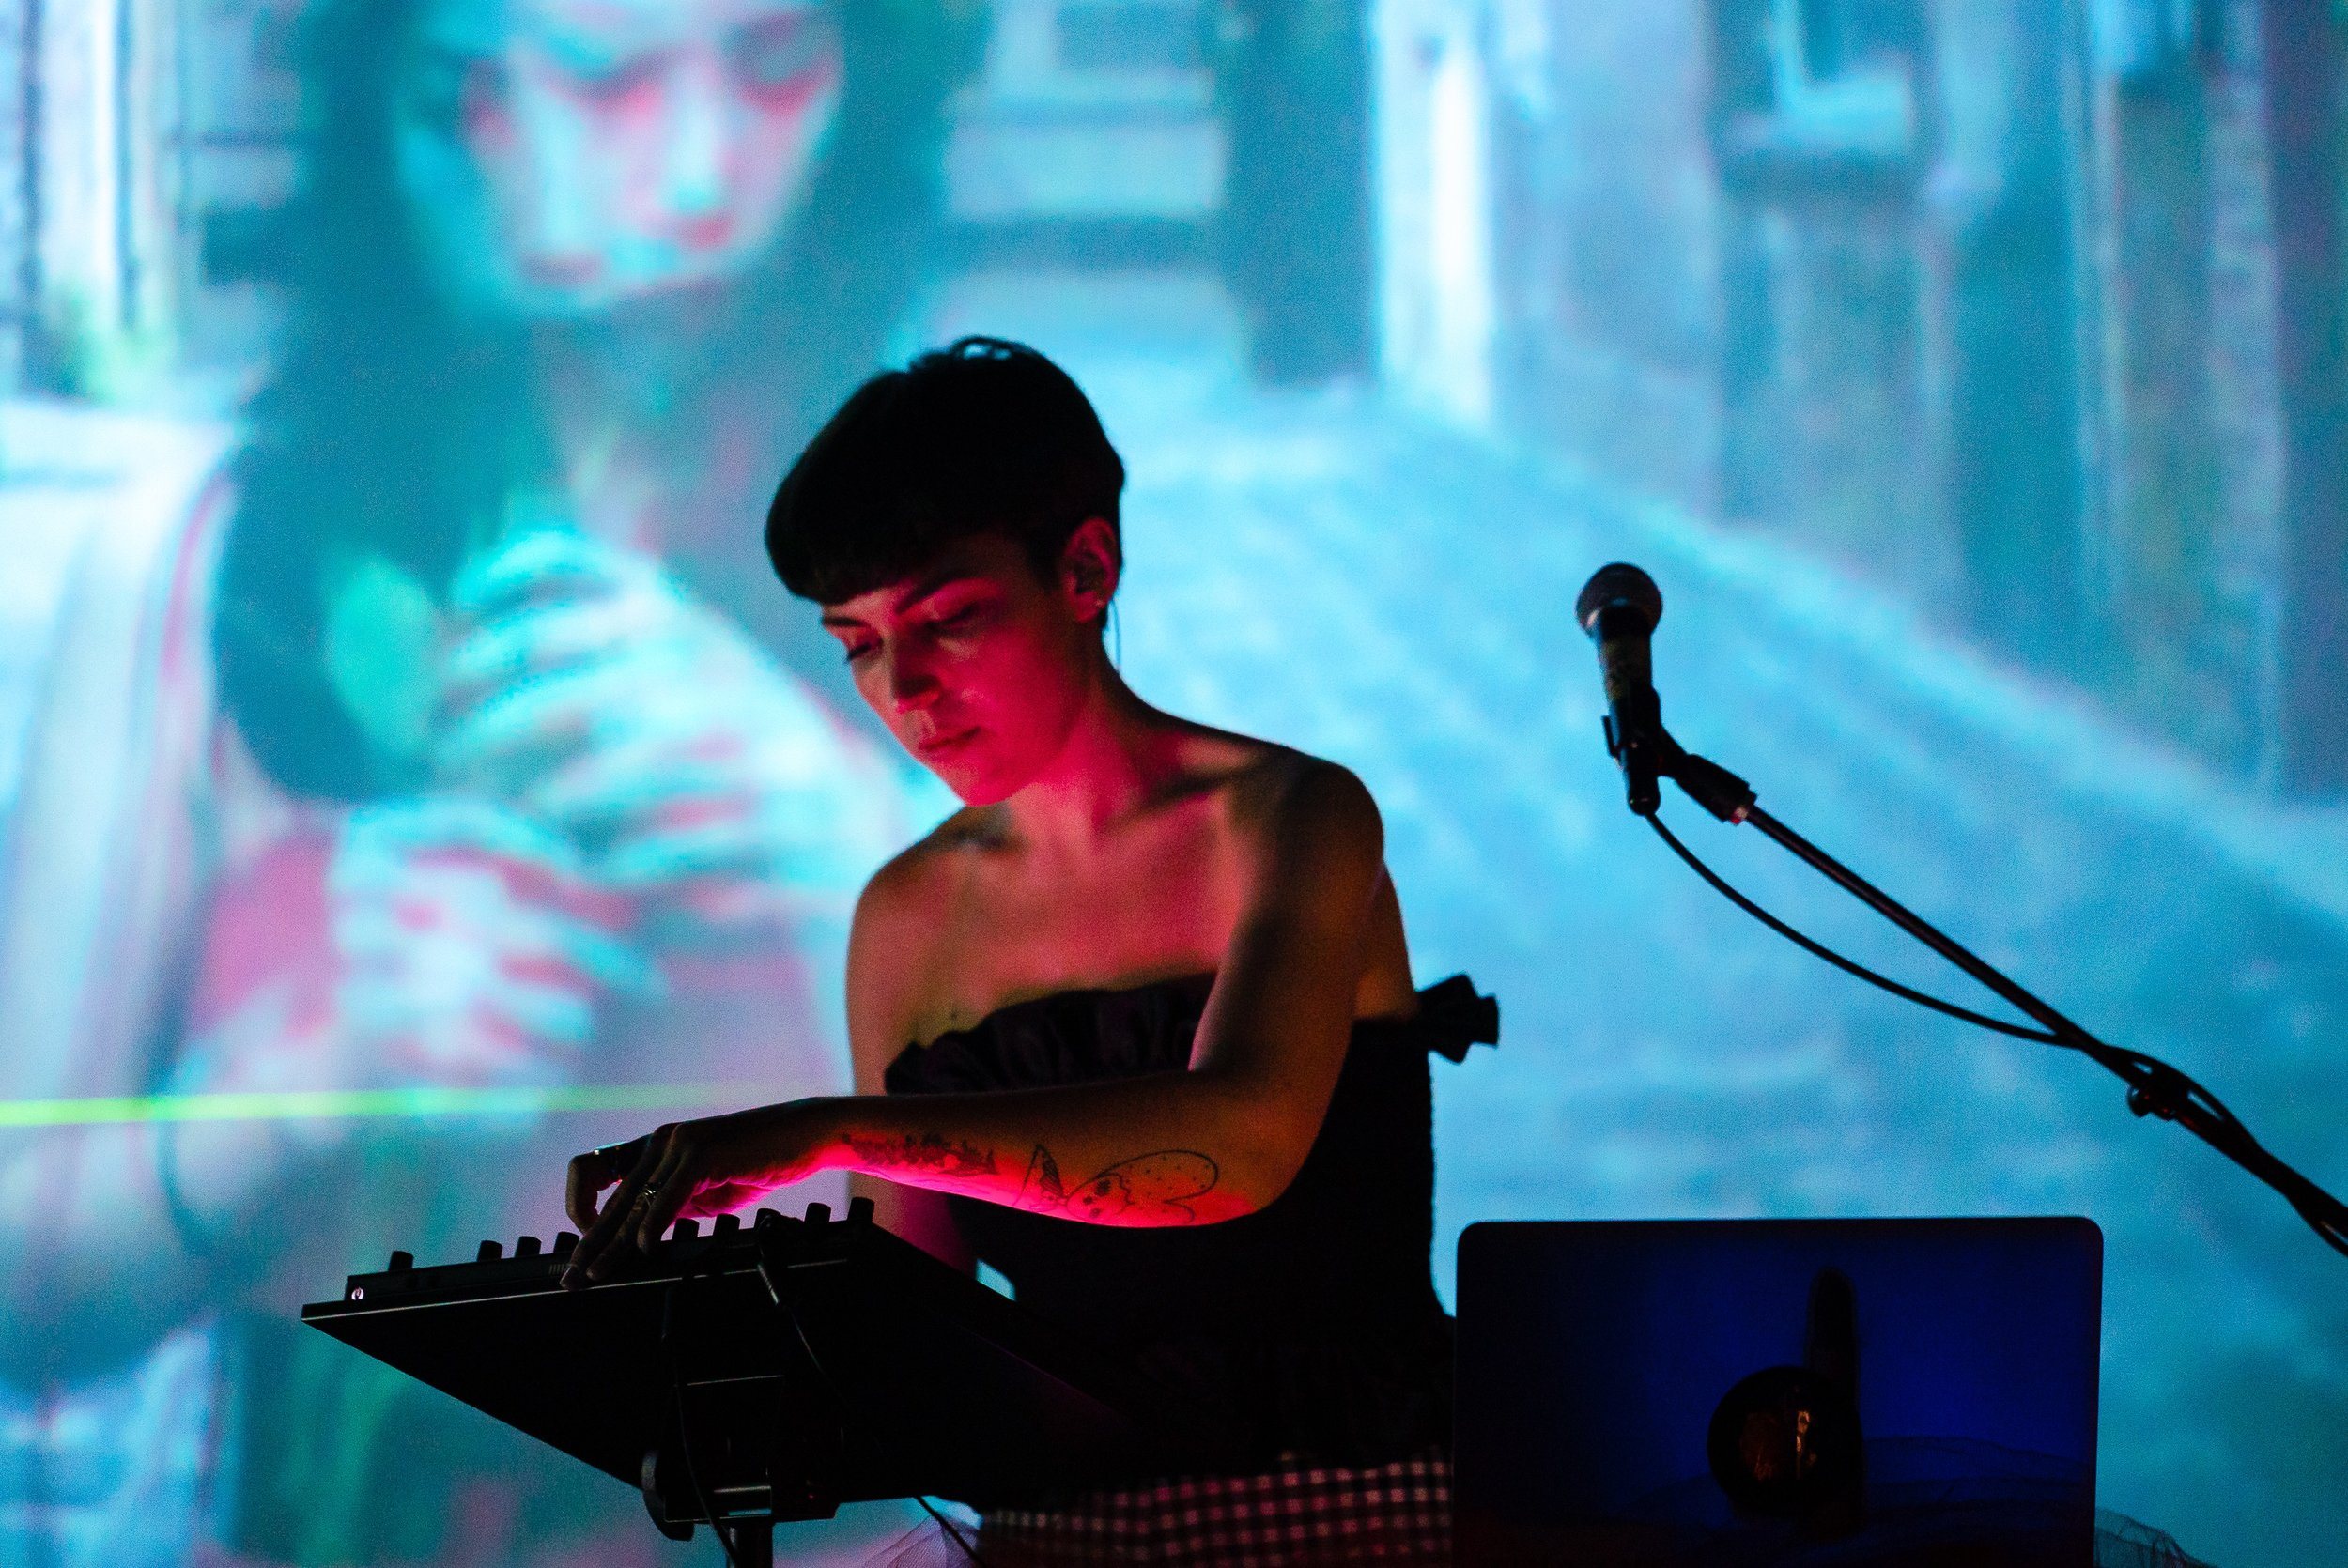 Drum & Lace by Priscilla C. Scott-6_small.jpg